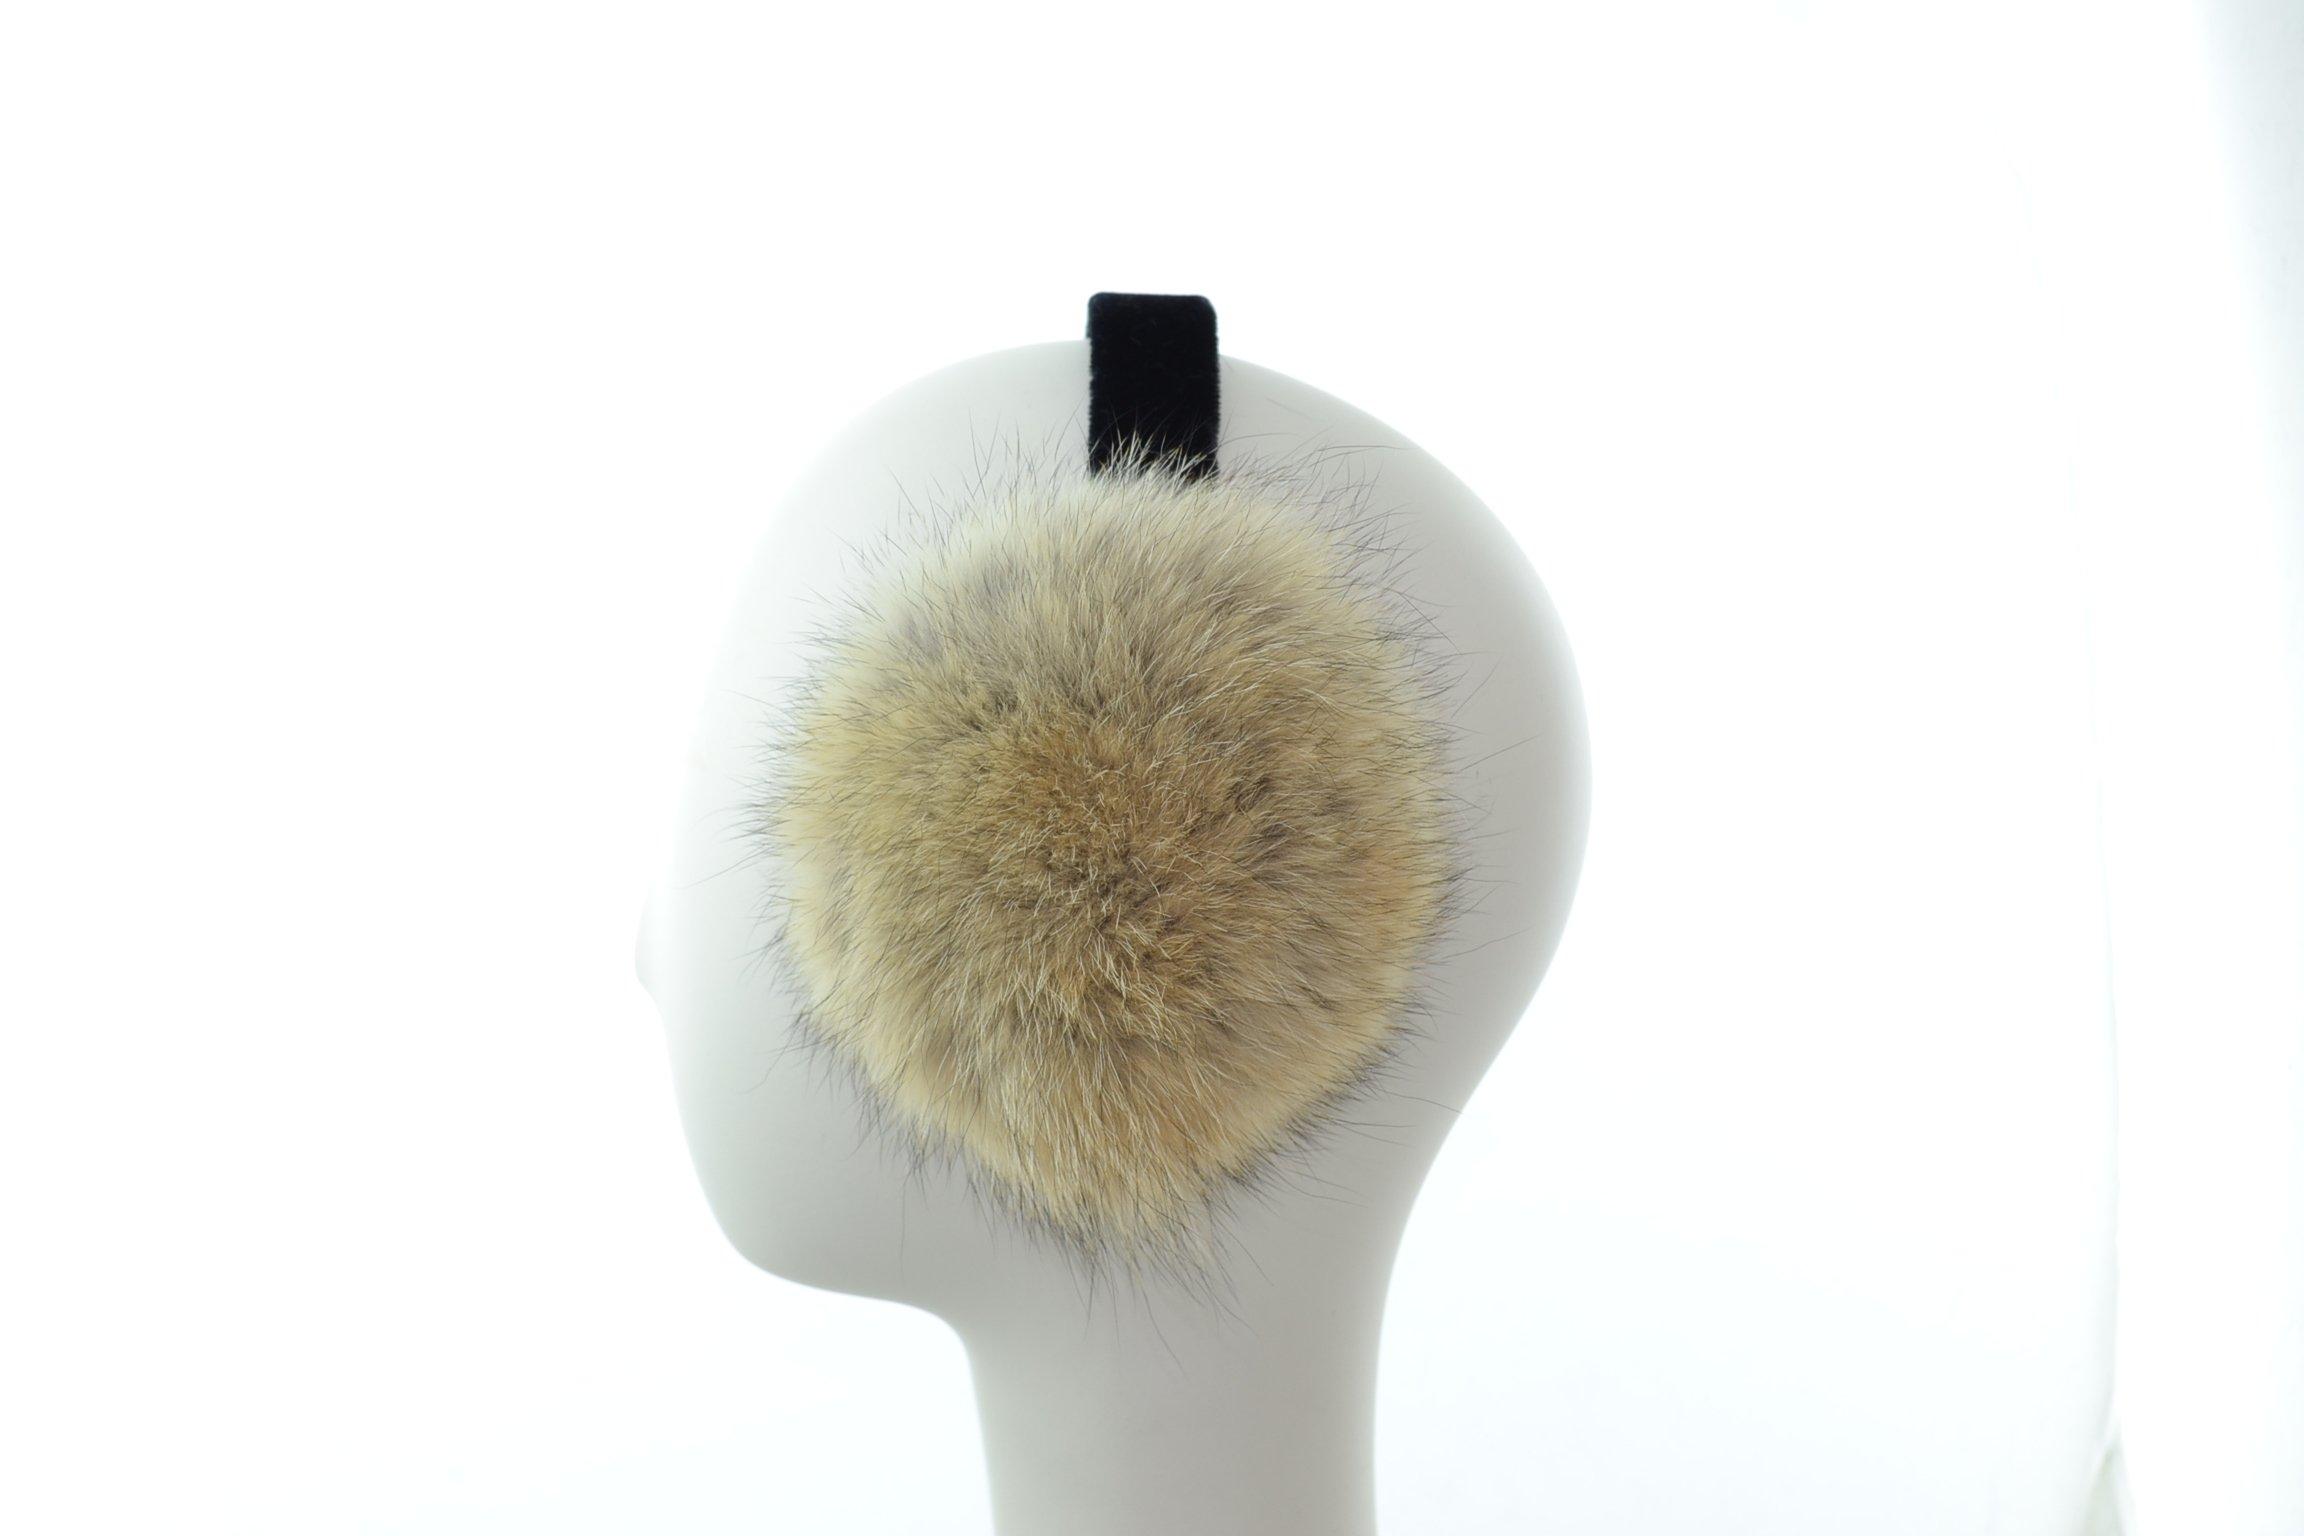 Surell Genuine Soft Beige Coyote Fur Earmuffs with Black Non Adjustable Velvet Head Band - Winter Fashion Ear Warmers - Perfect Elegant Women's Luxury Gift